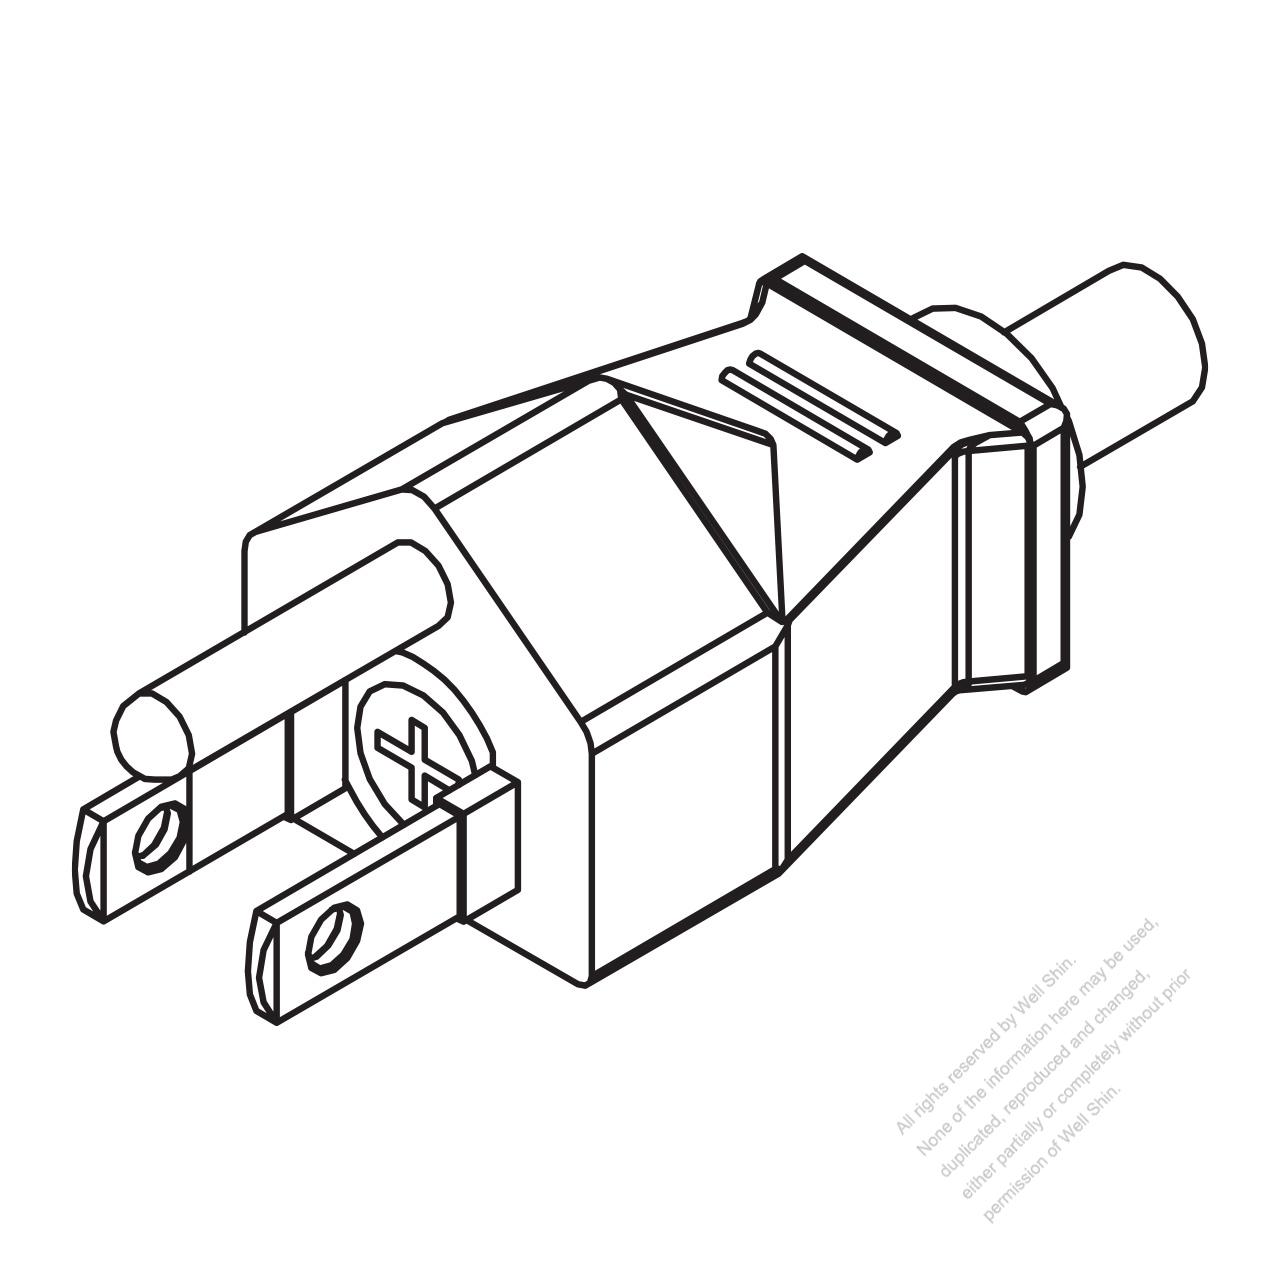 Taiwan Japan 3 Pin Straight Ac Plug 7 15a 125v With Fuse